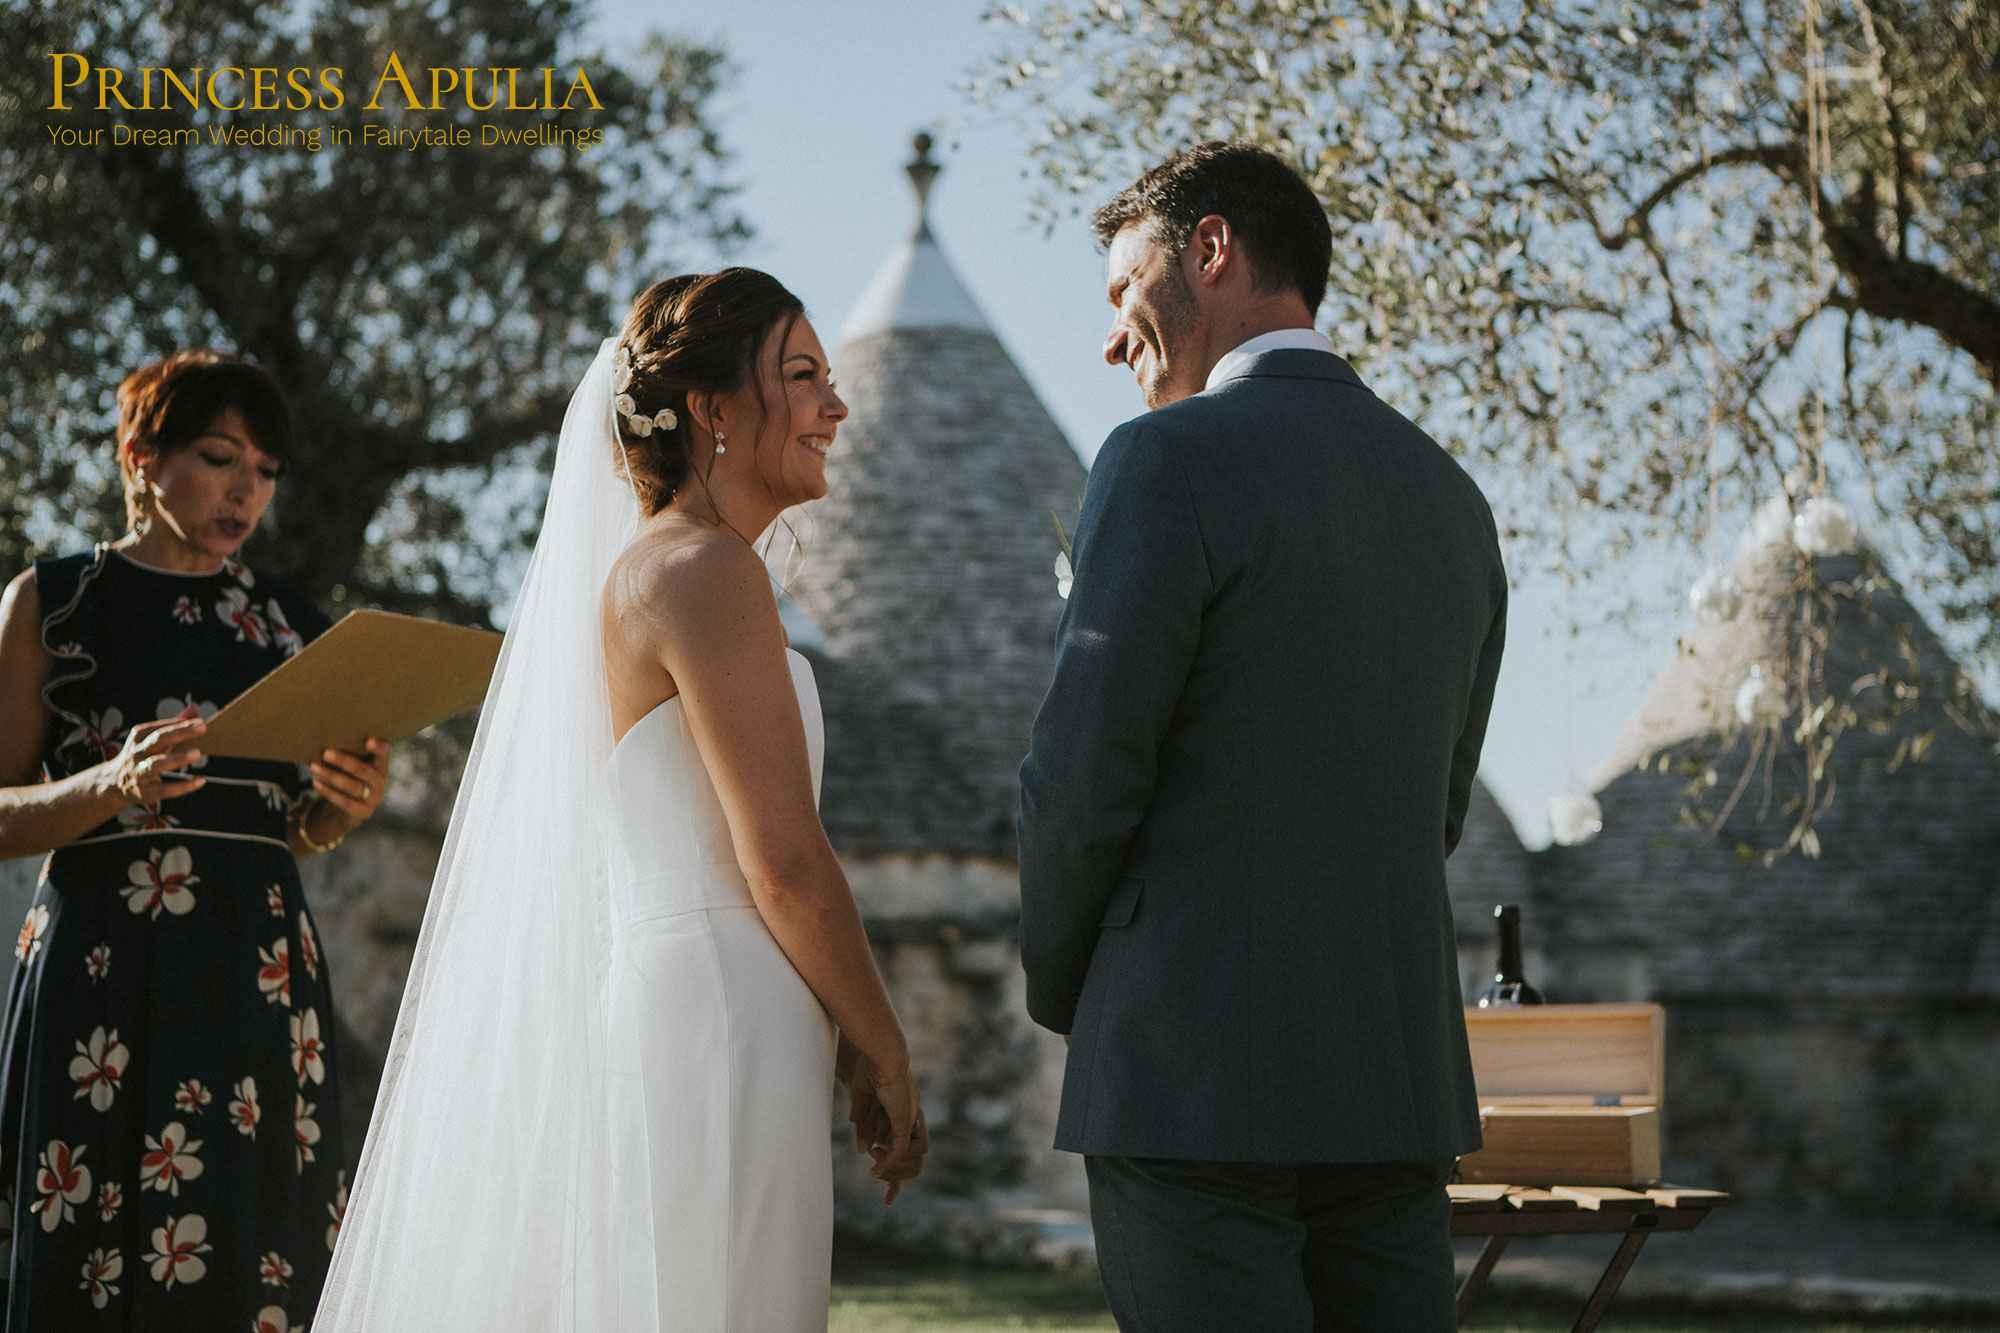 Puglia wedding locations